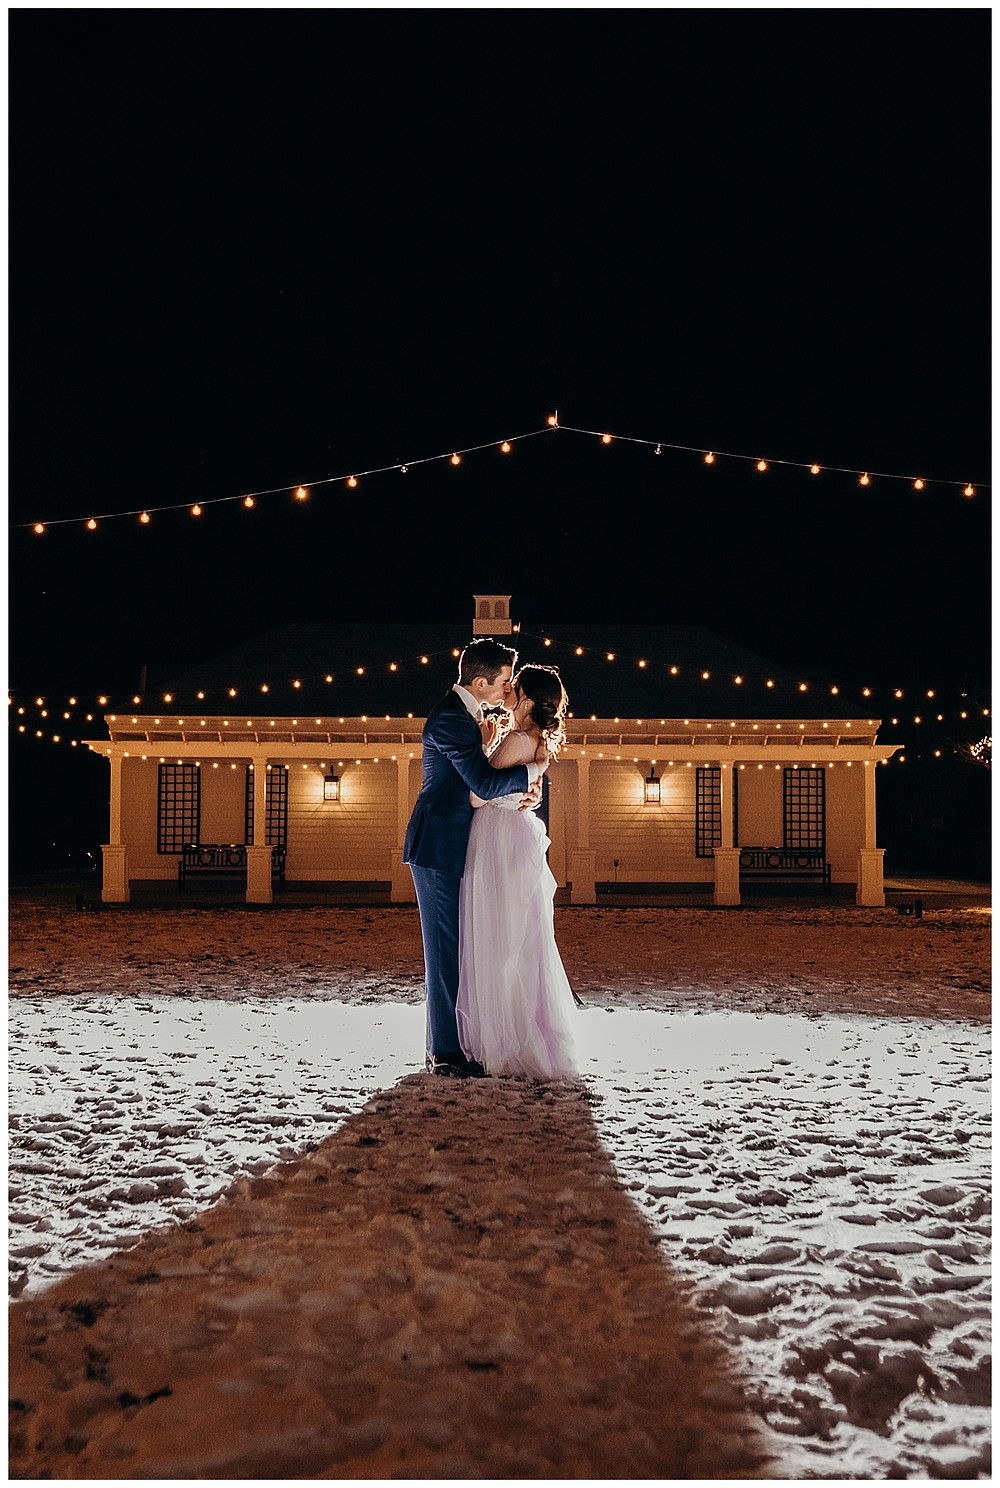 Night Time String Lit Bride & Groom Portraits